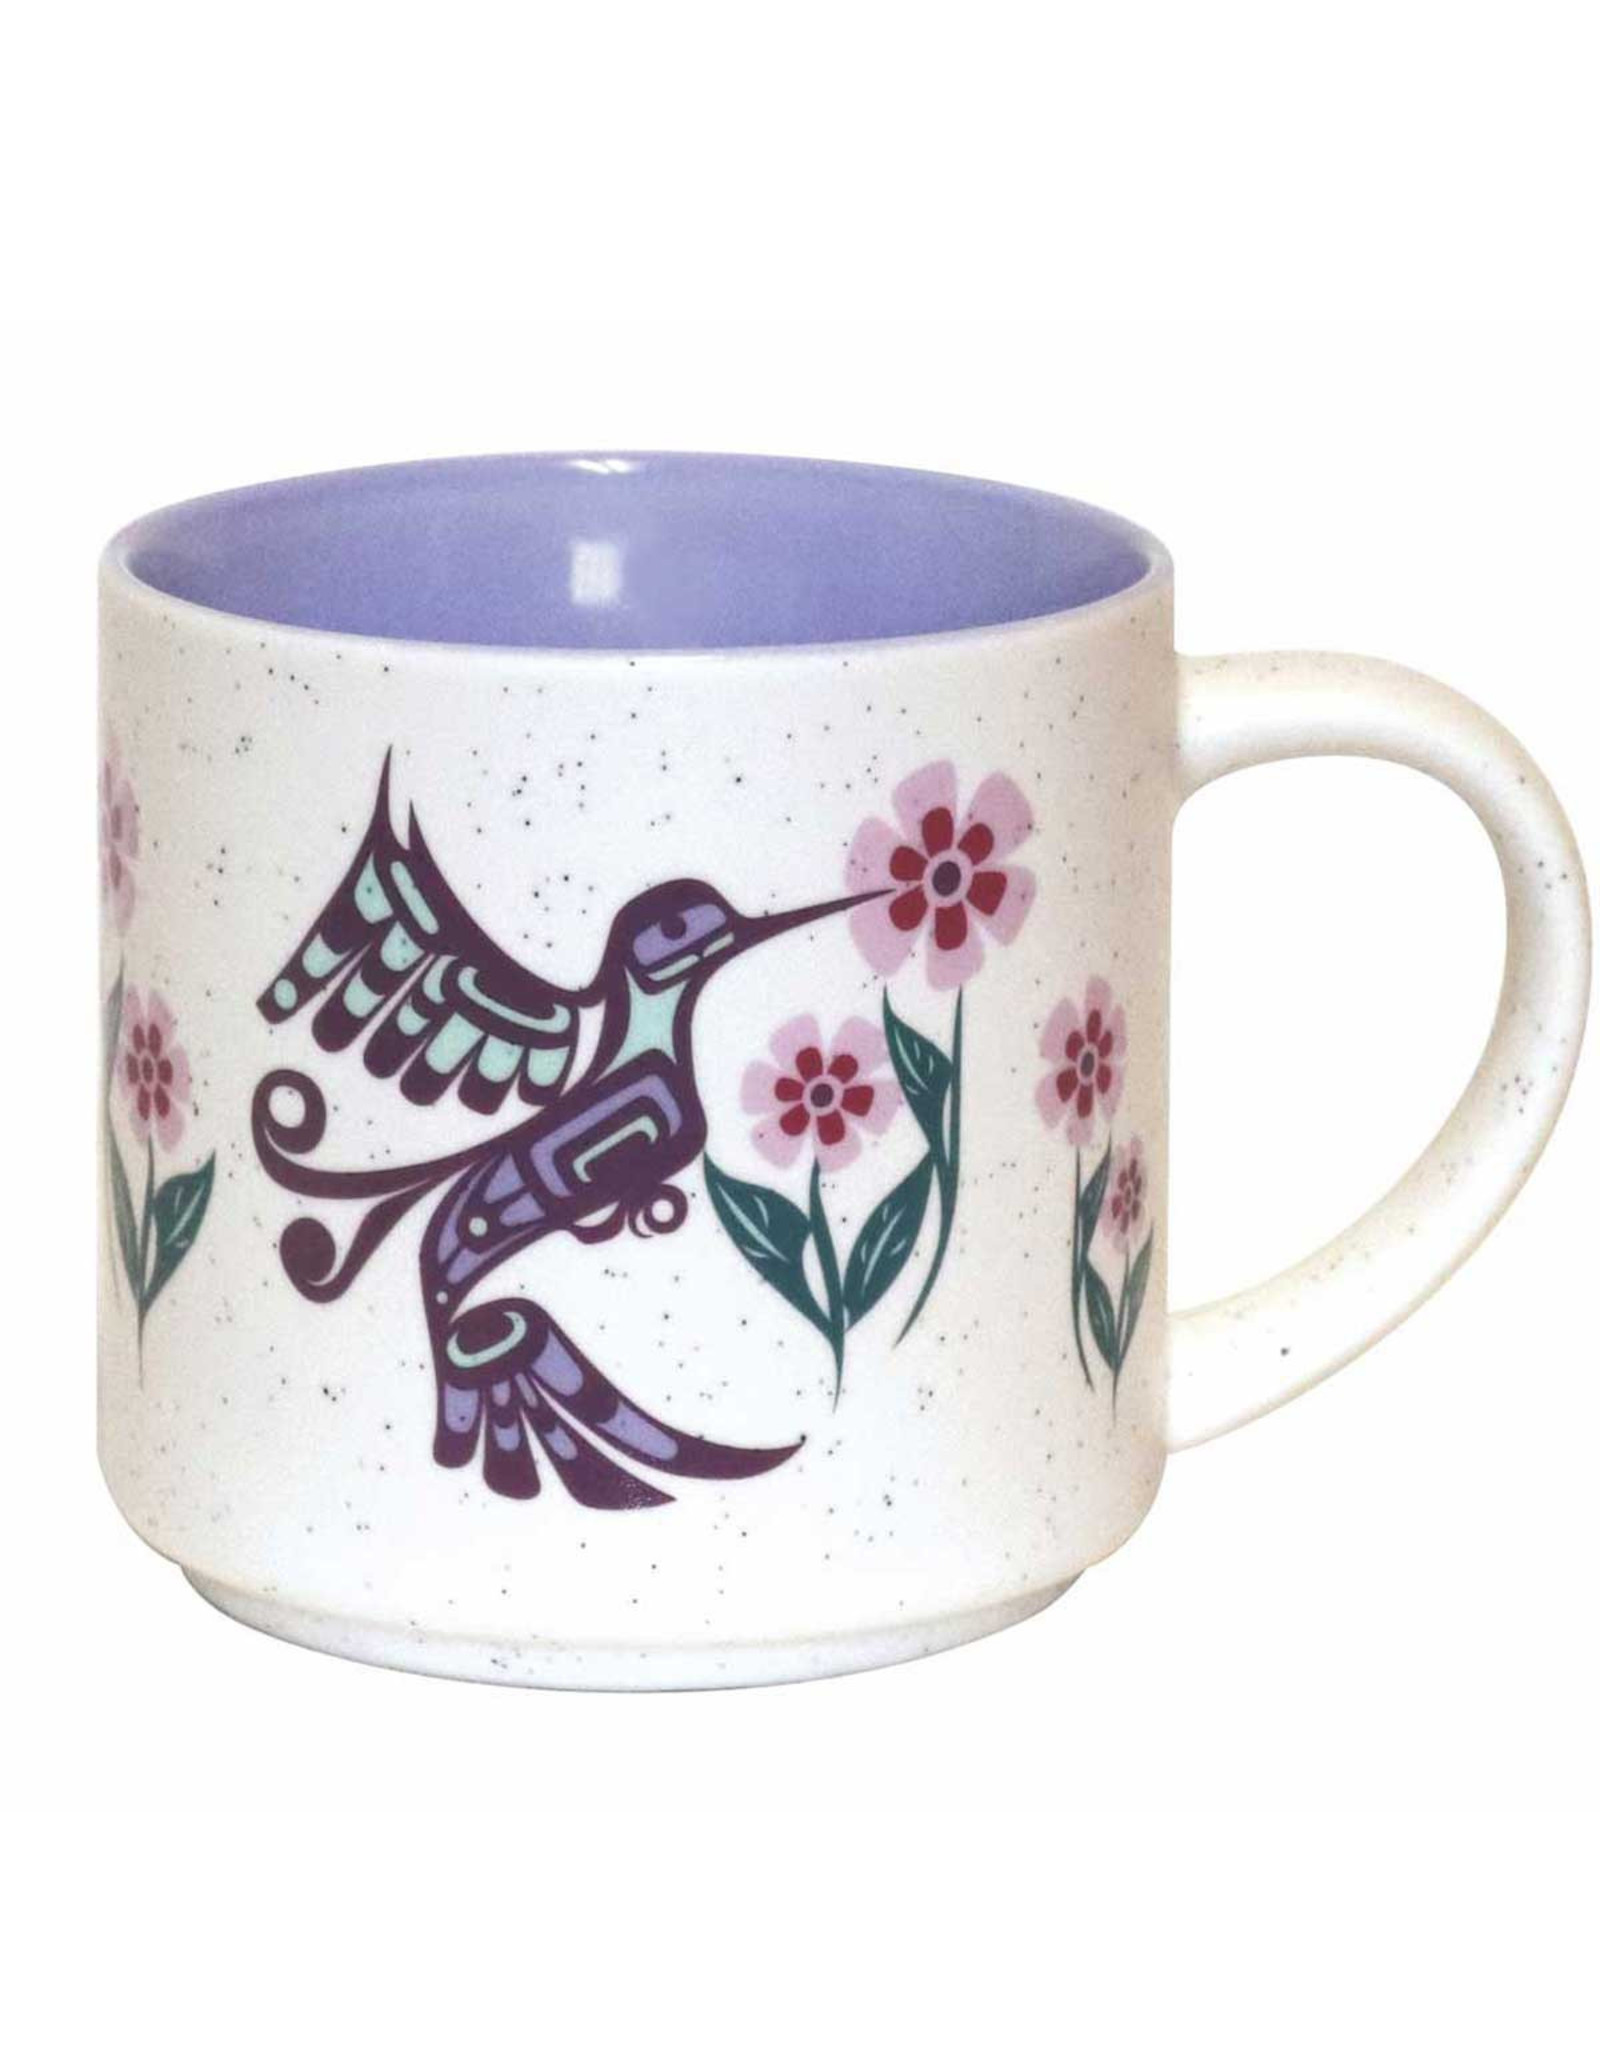 Ceramic Mug - Hummingbird (CMUG13)